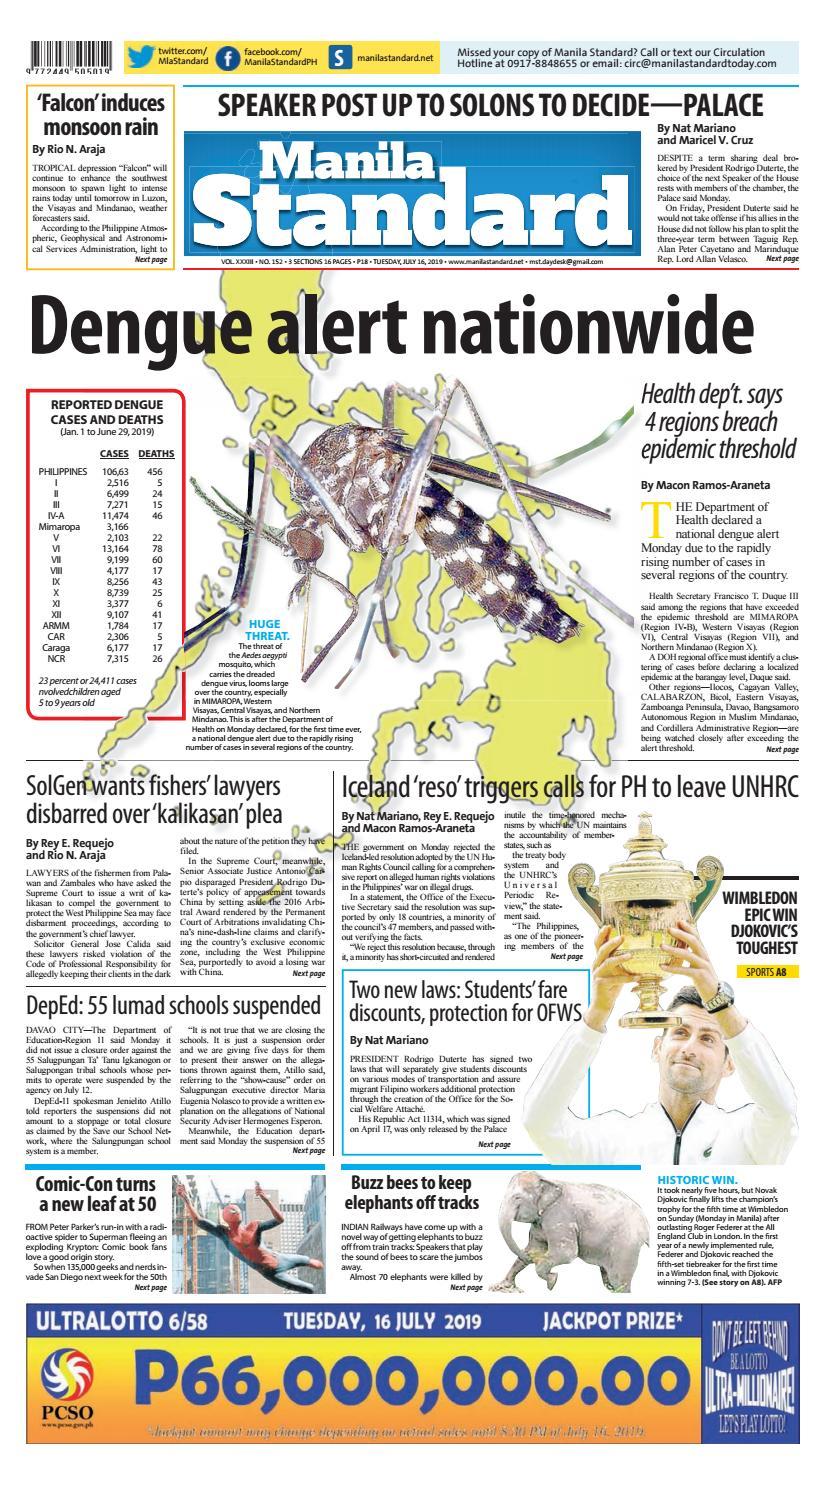 Manila Standard - 2019 July 16 - Tuesday by Manila Standard